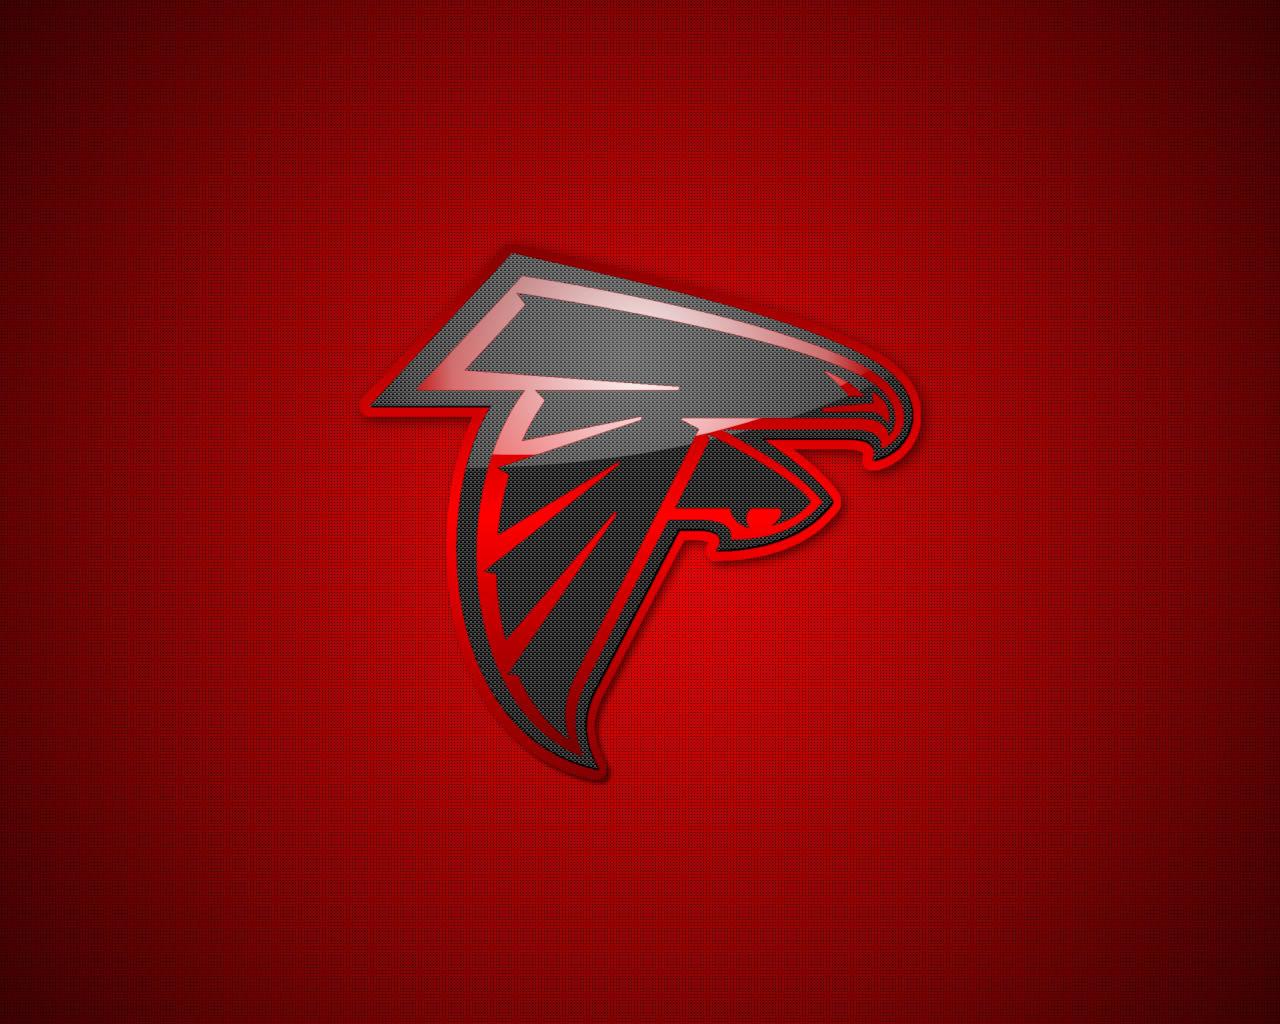 Atlanta Falcons Wallpaper Download Free Cool Full Hd: Falcon Wallpaper